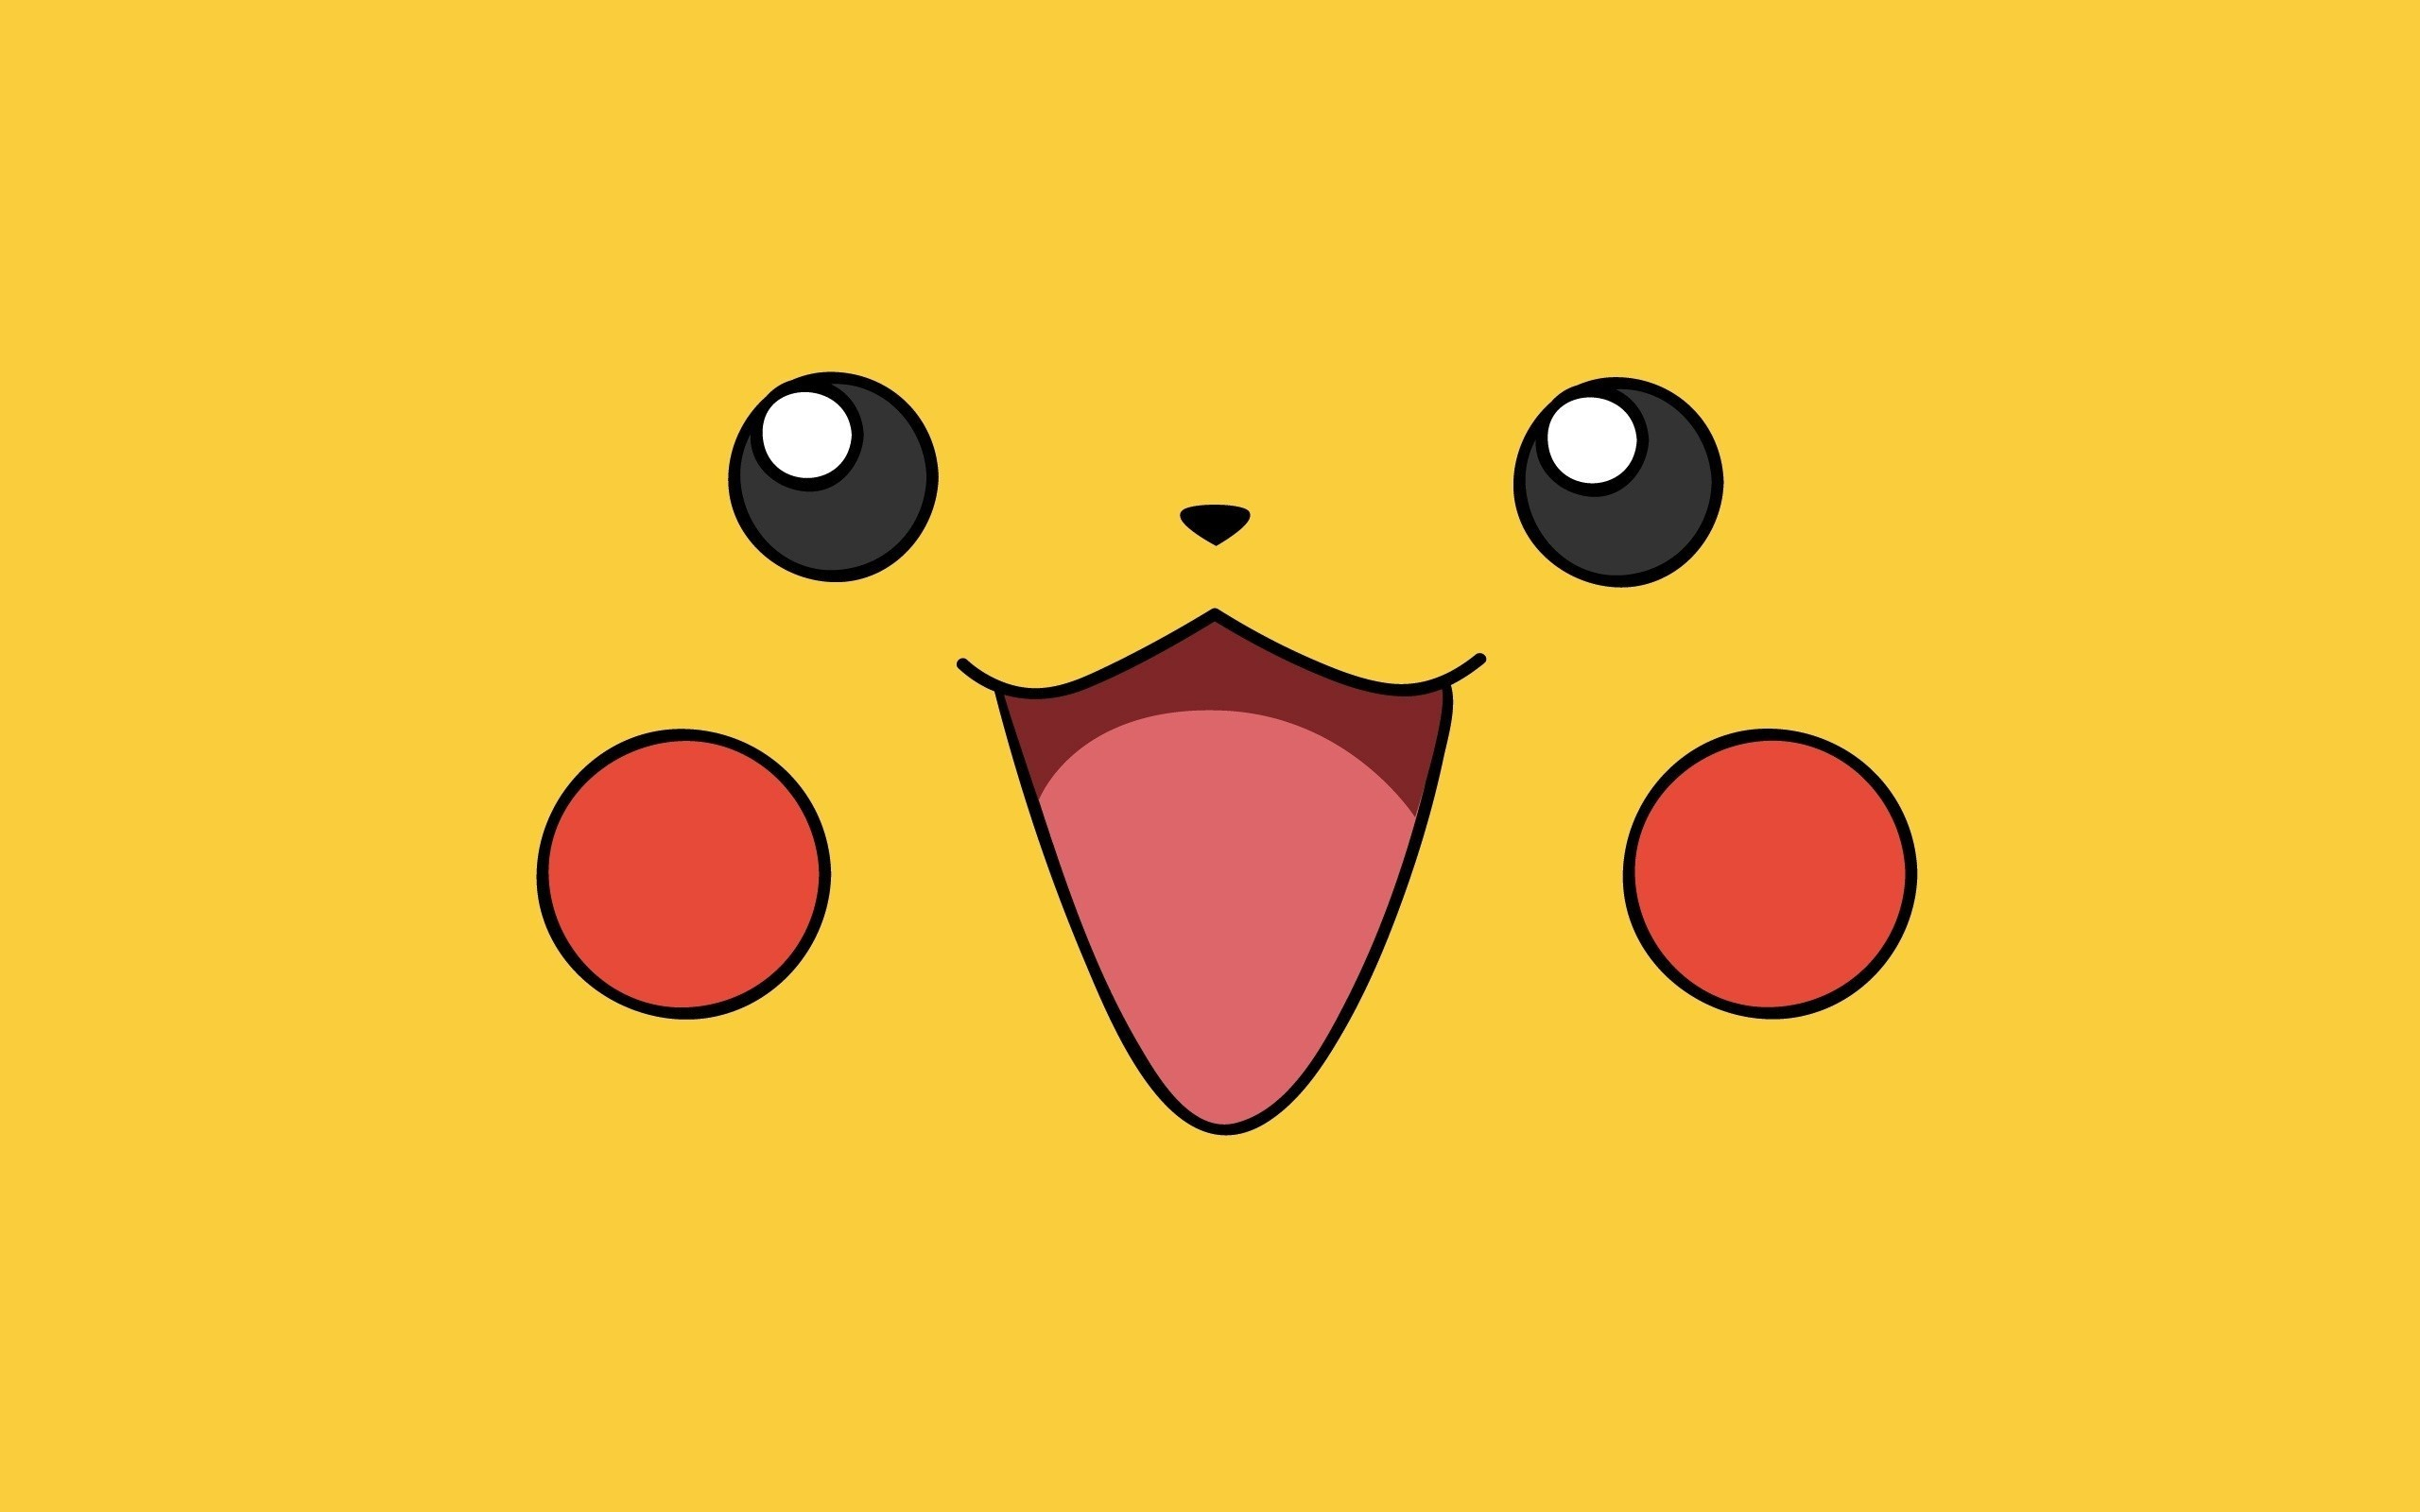 Pikachu Pokemon Cute Face Creative Cartoon